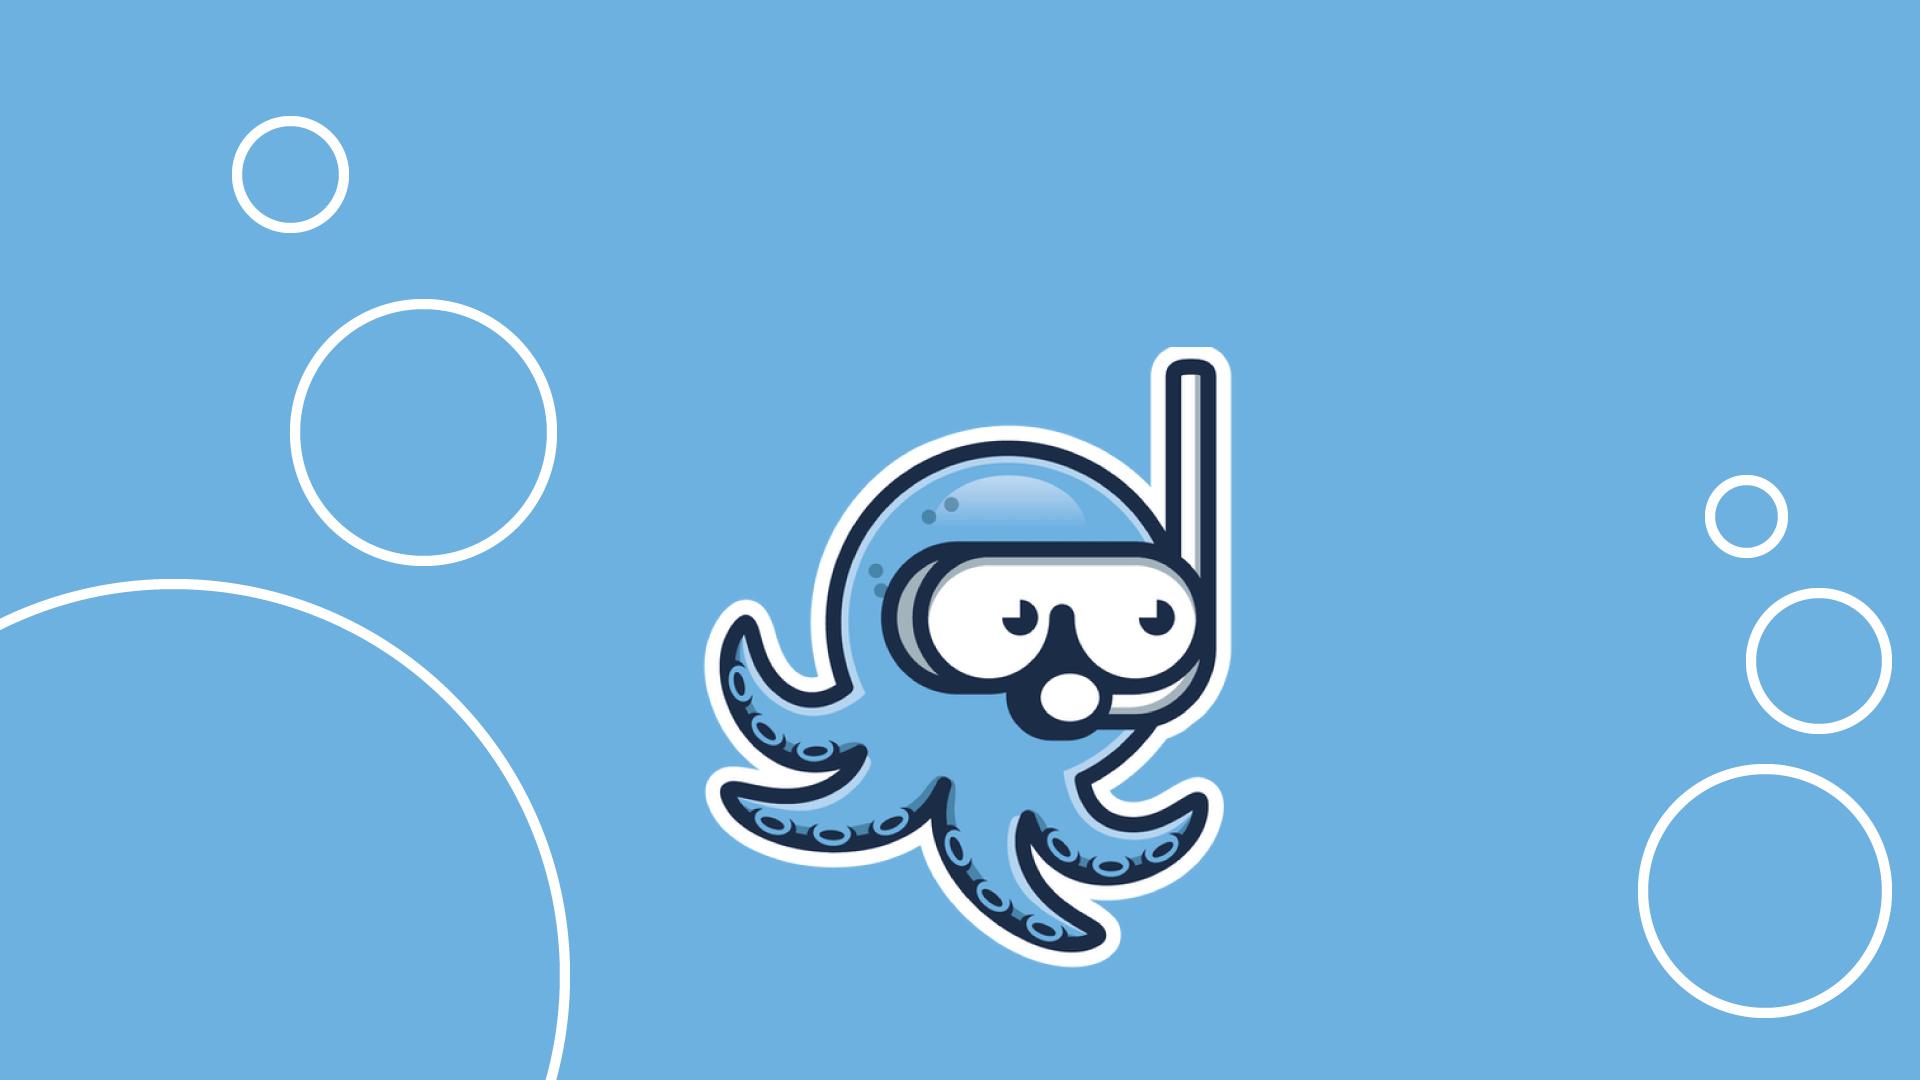 The Snorkel Logo